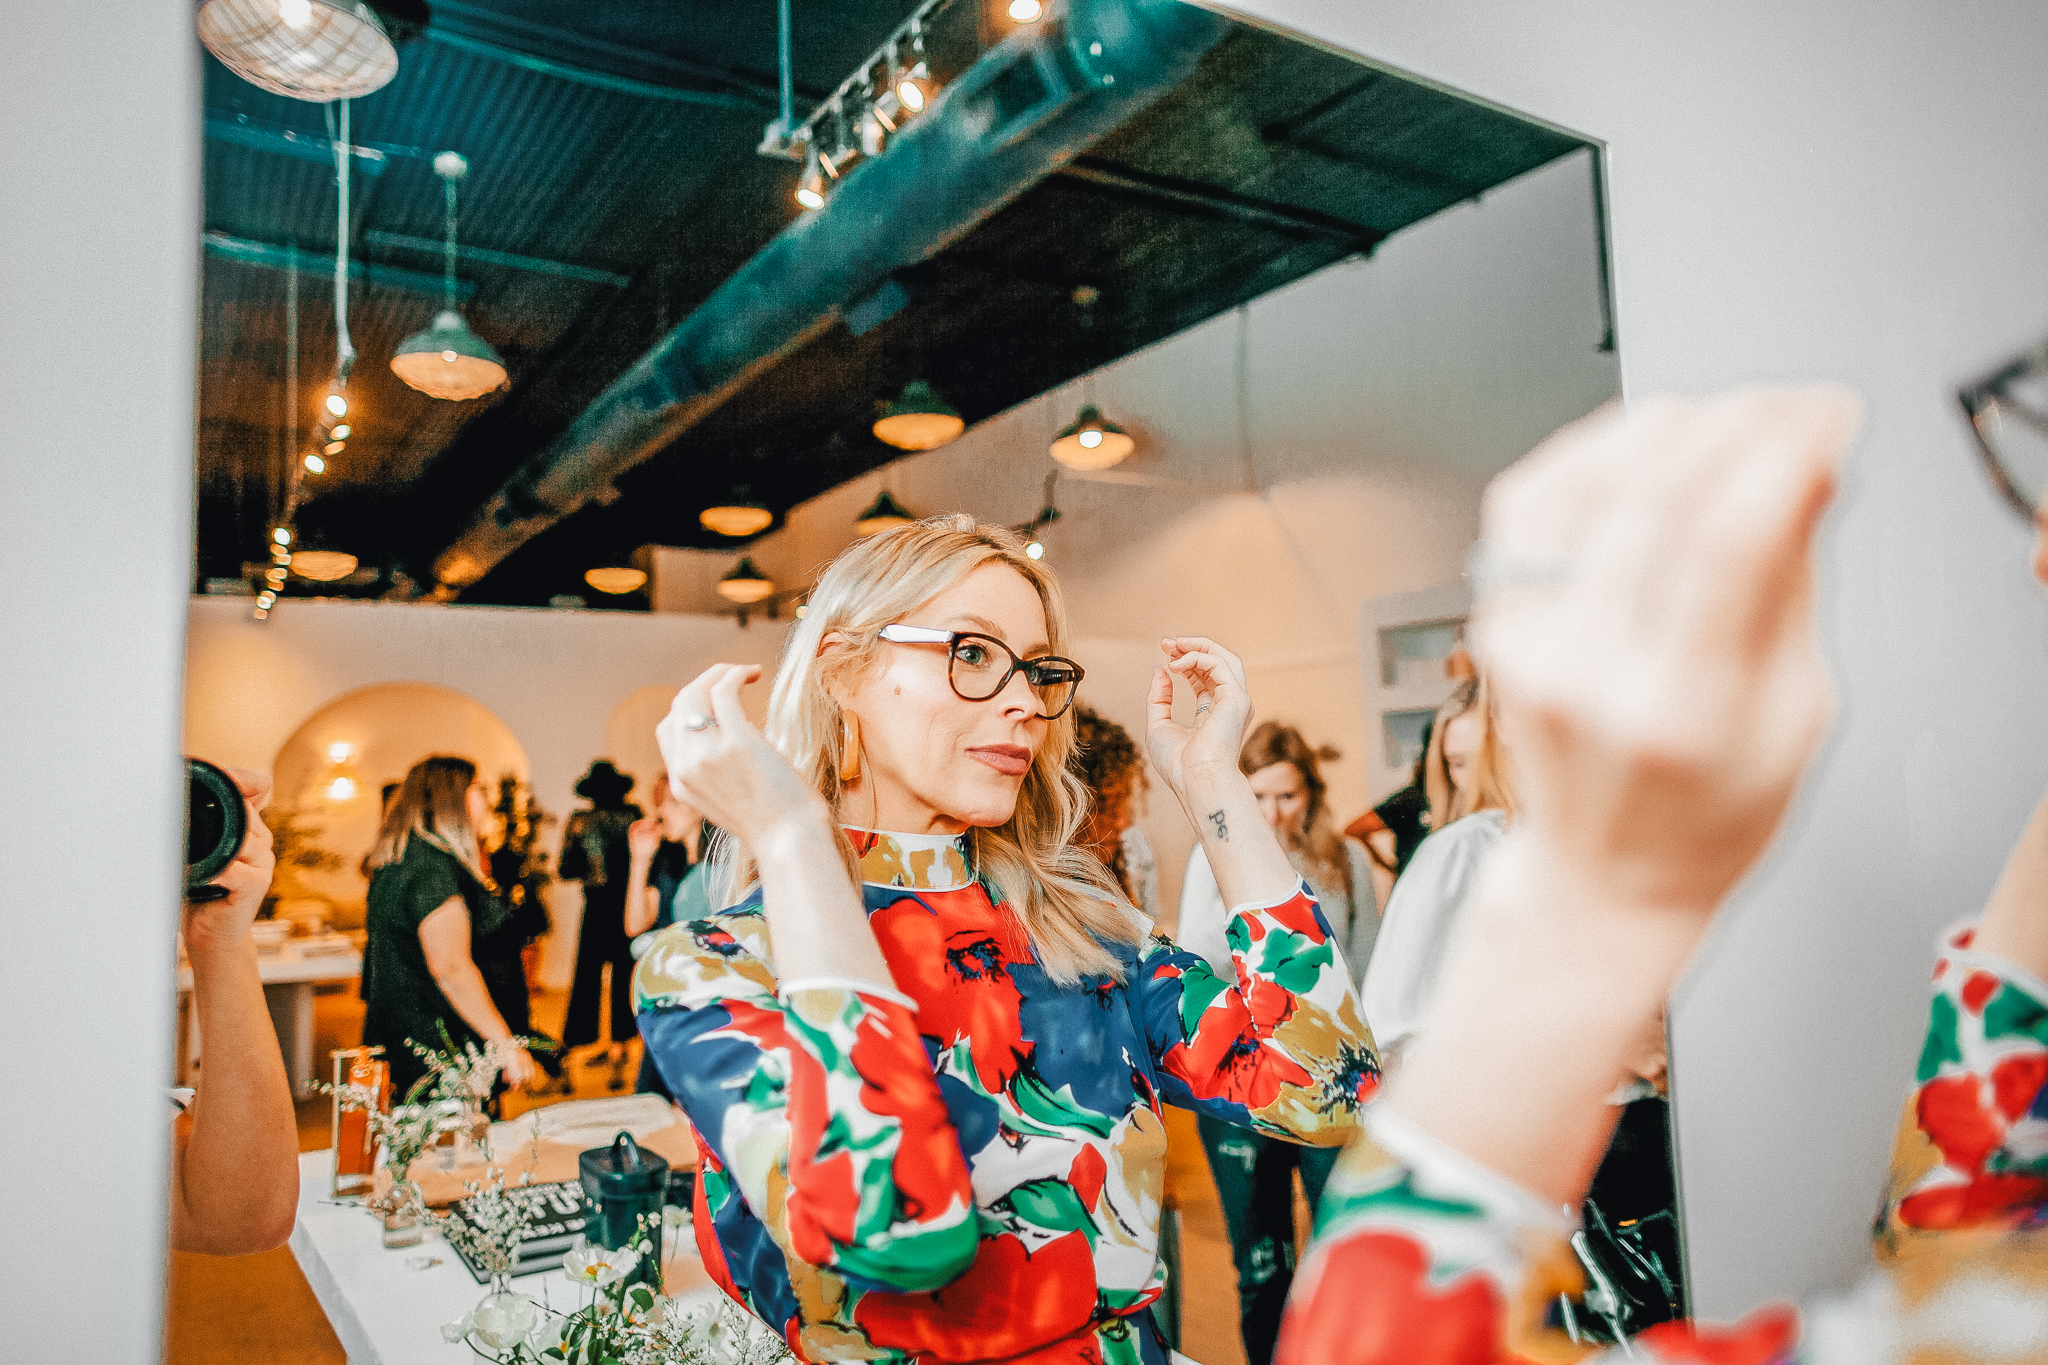 SXSW 2019 Recap: LensCrafters Event at the Austin Goop Pop-Up